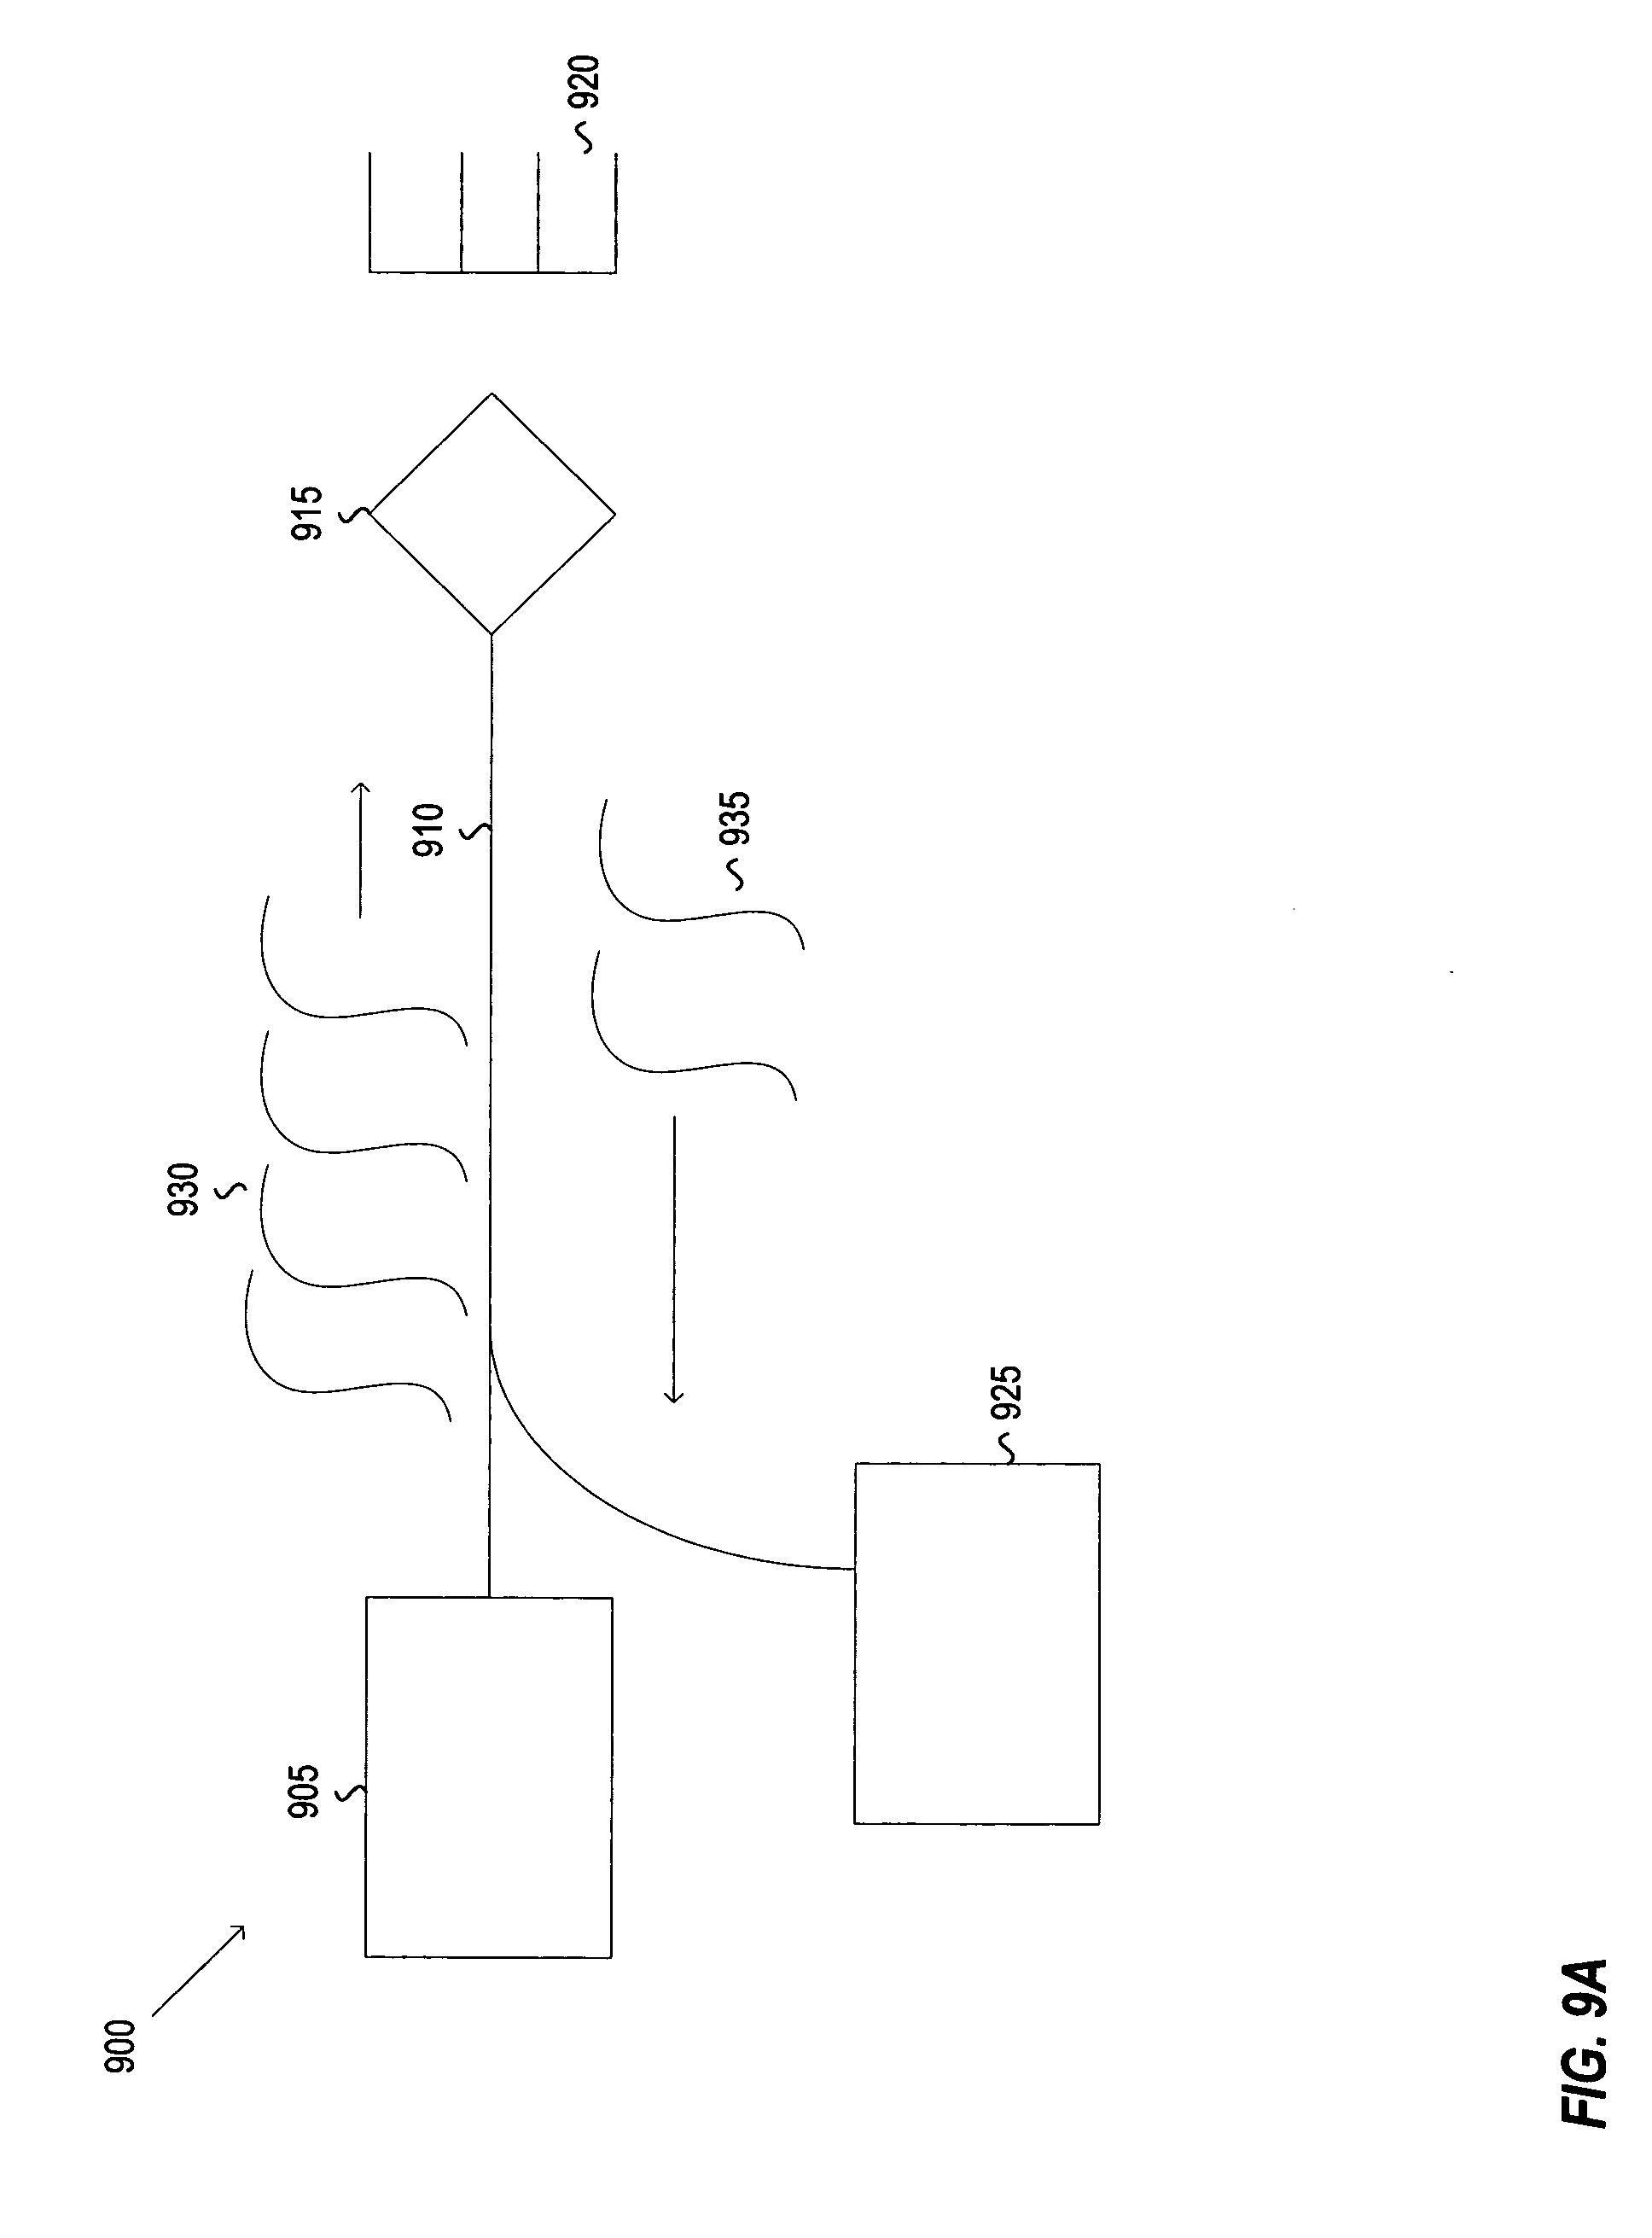 Qualitrol 910 Wiring Diagram : 28 Wiring Diagram Images